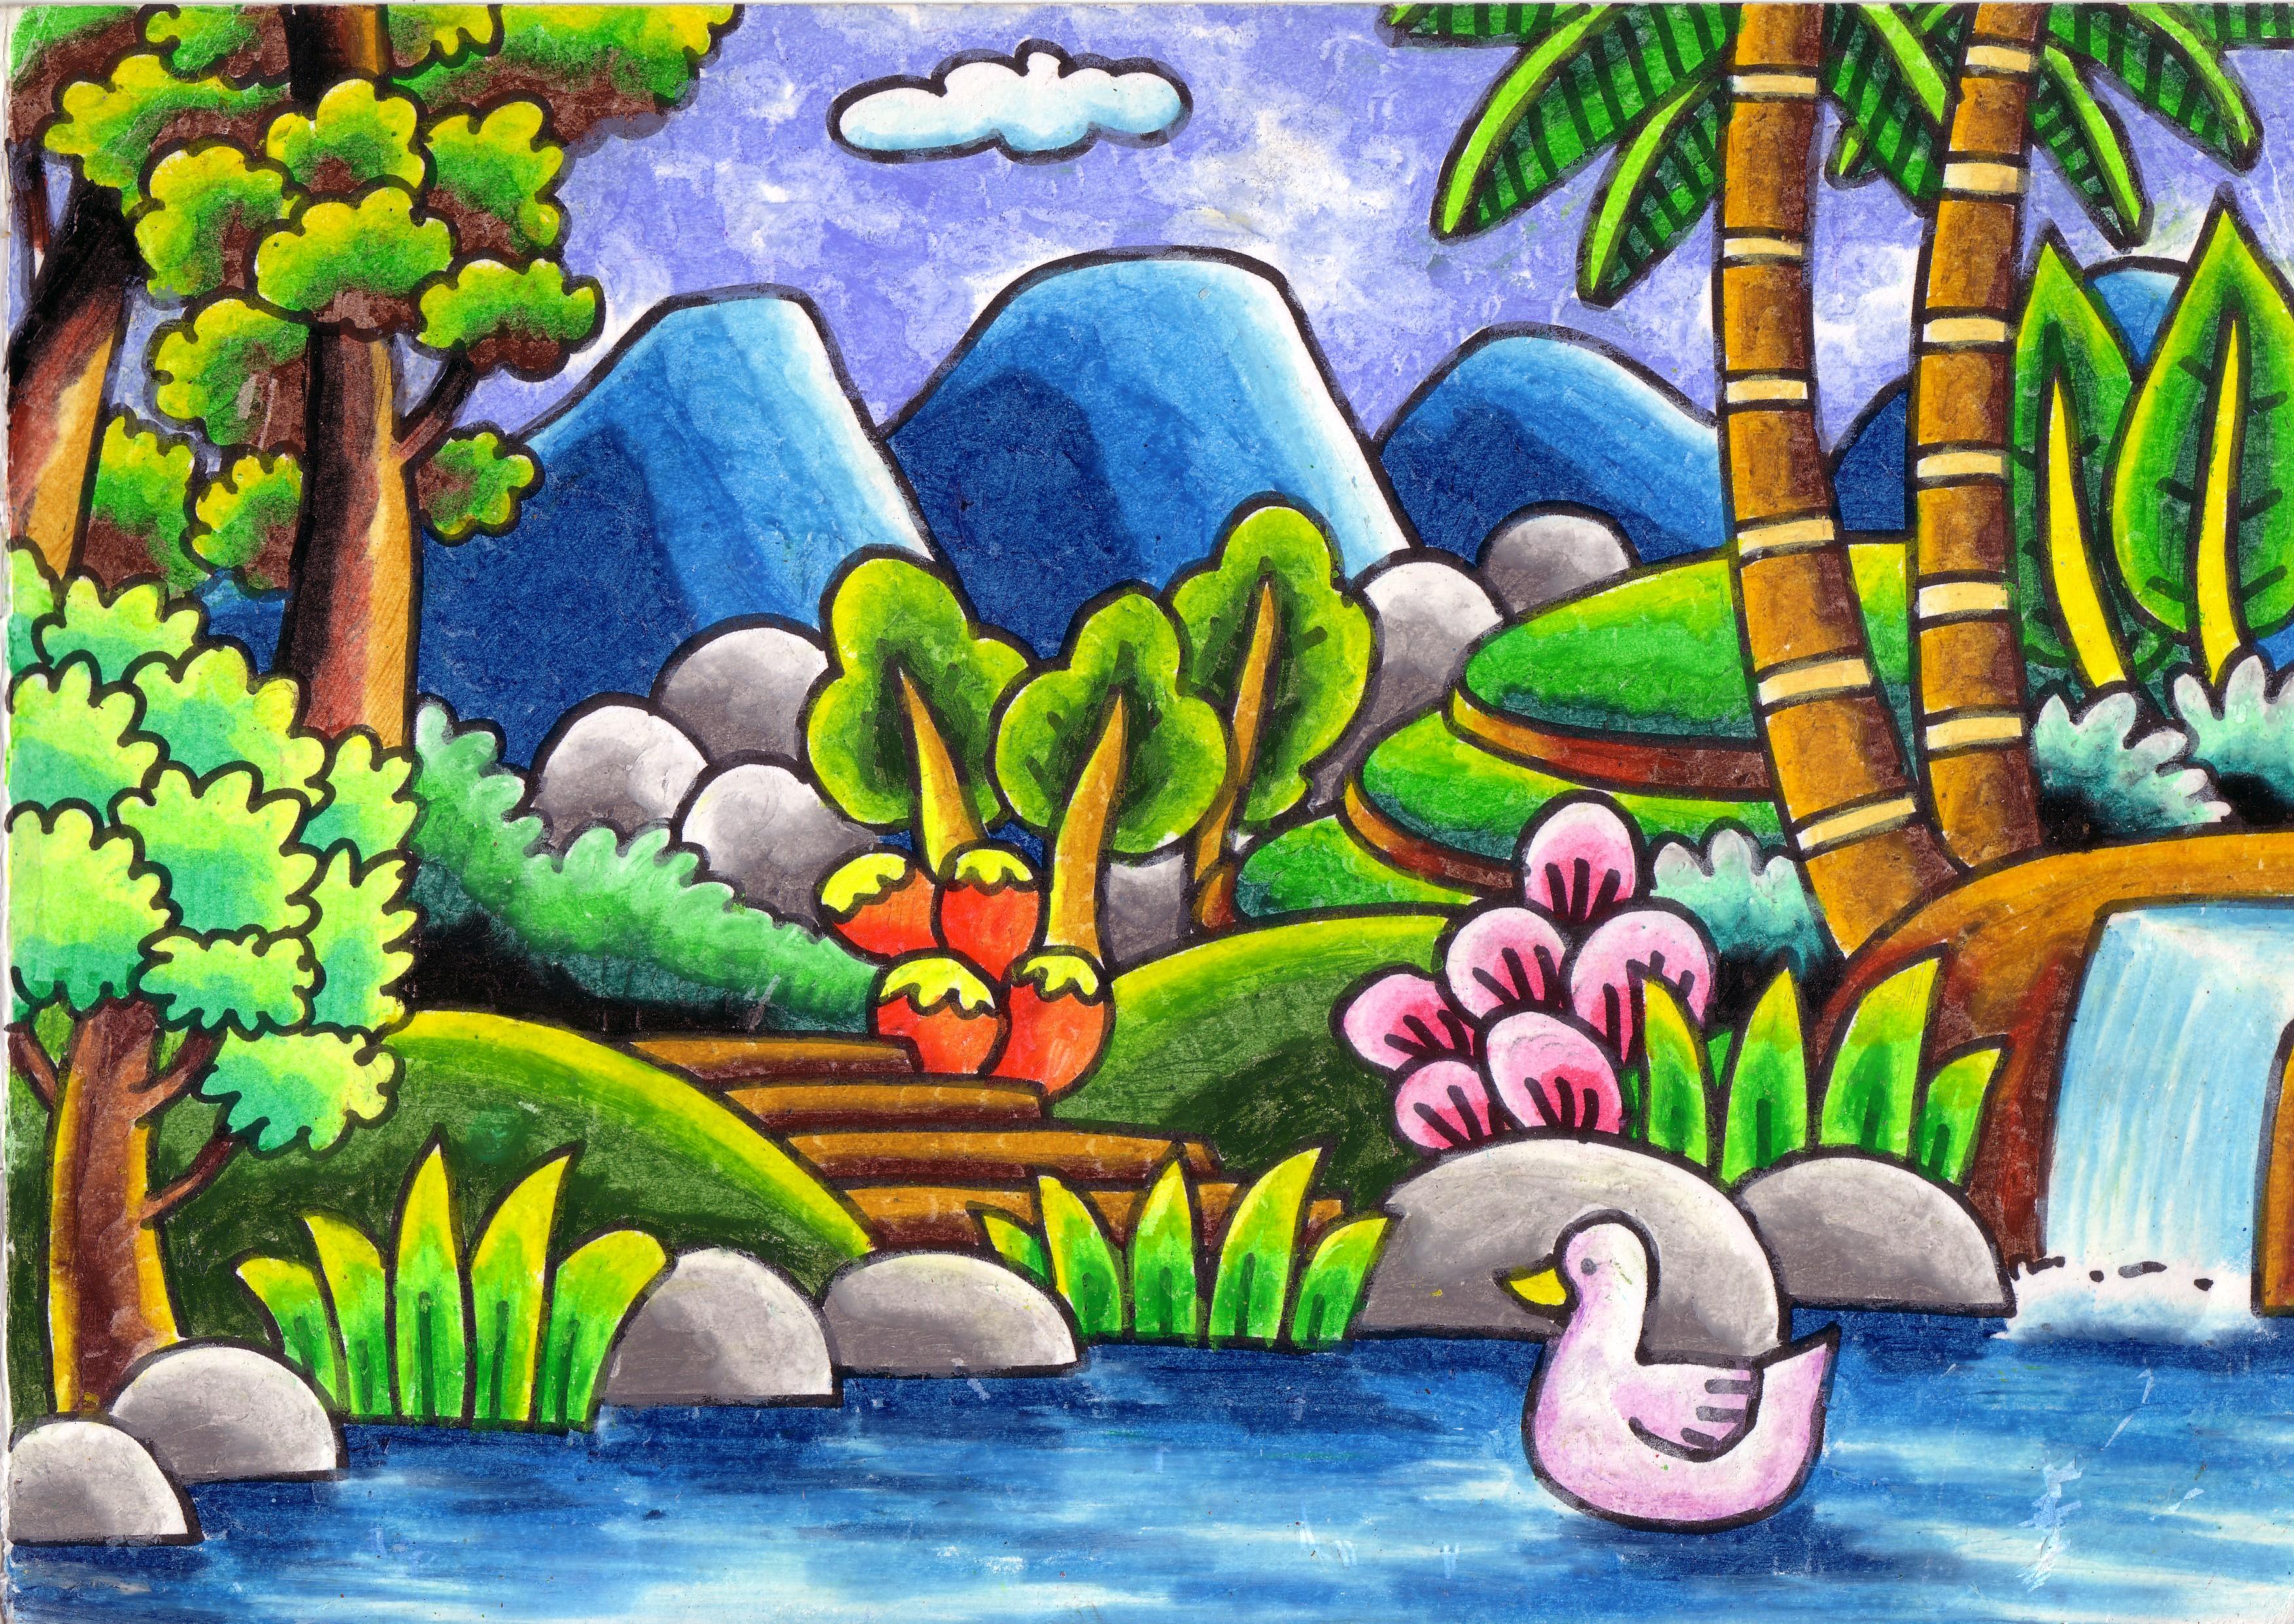 Pop Art Landscape Art Projects For Kids Coloring Book 7 15323.